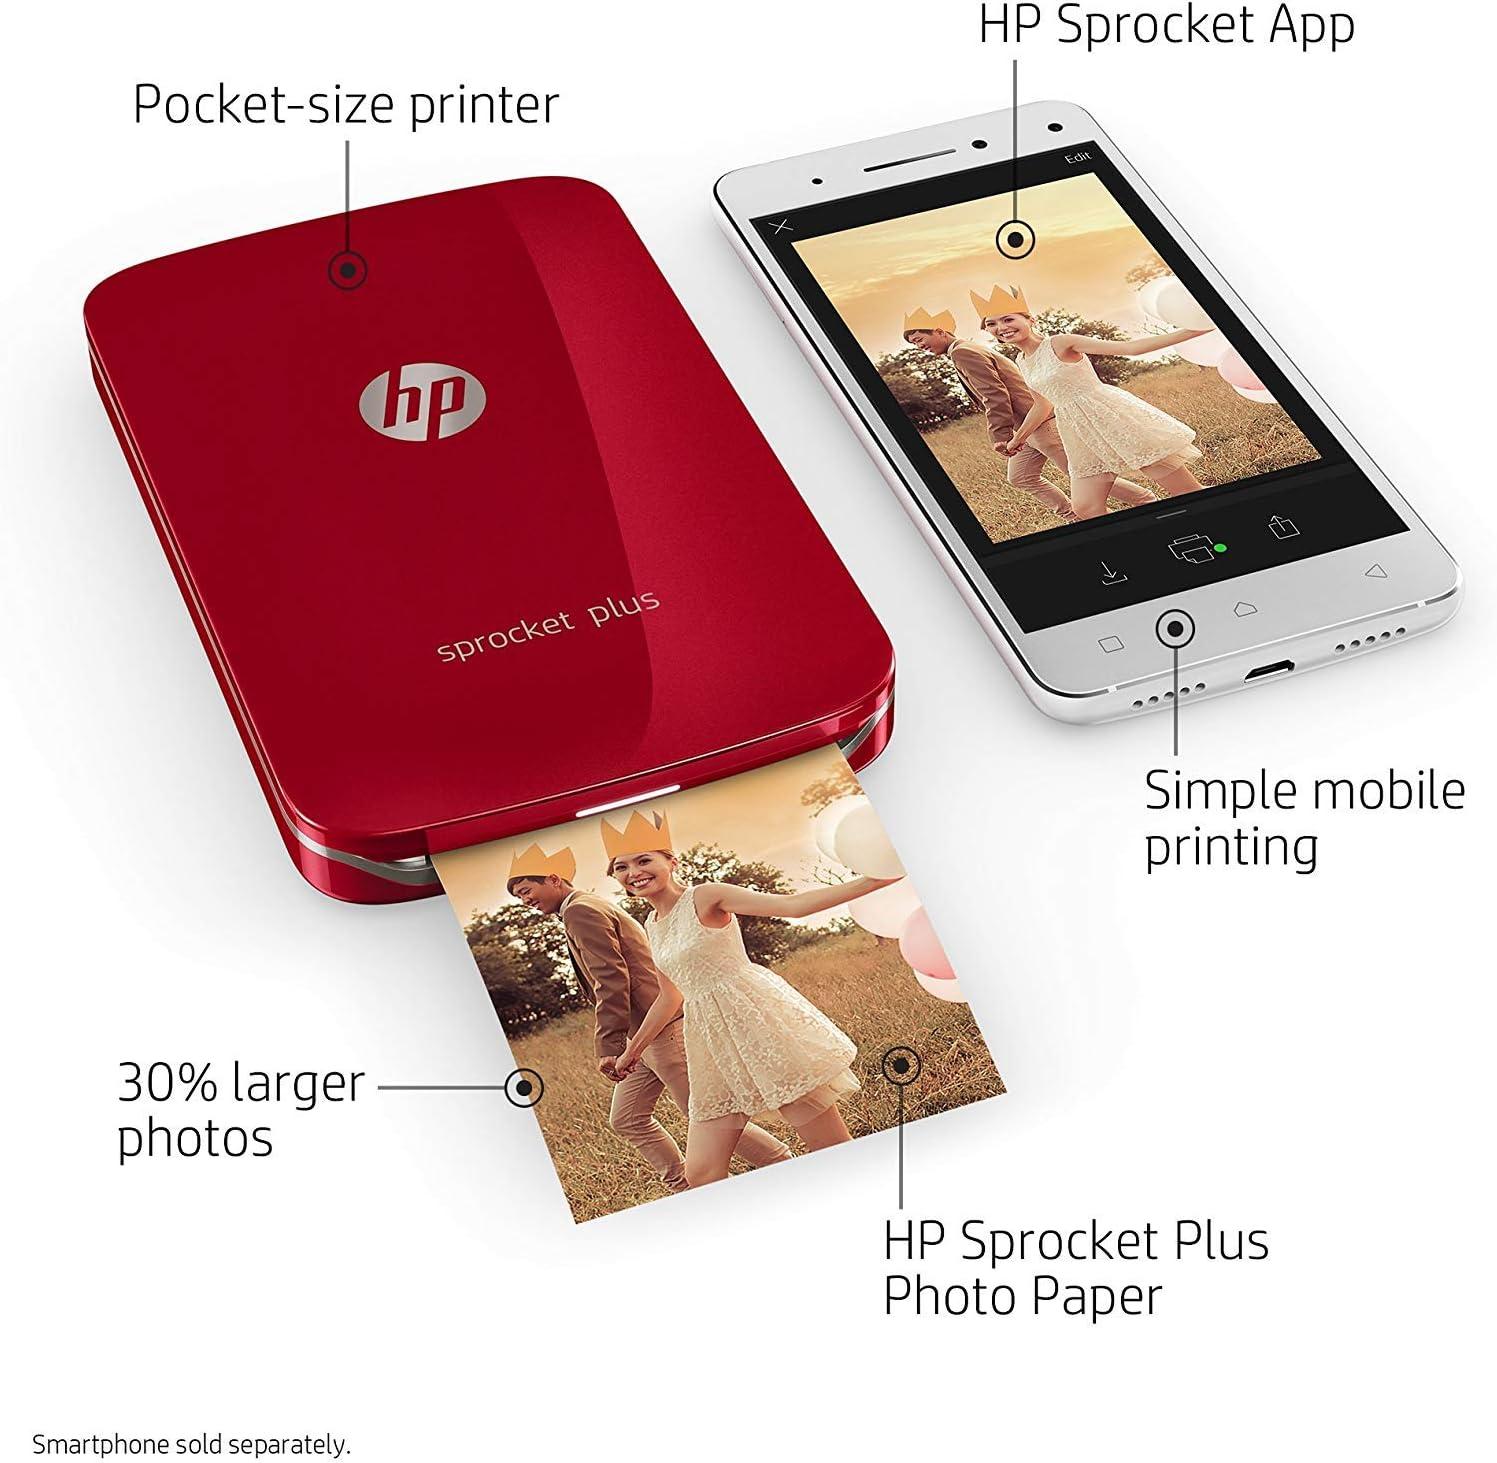 HP Sprocket Plus impresora de foto ZINK (Zero ink) 313 x 400 DPI ...